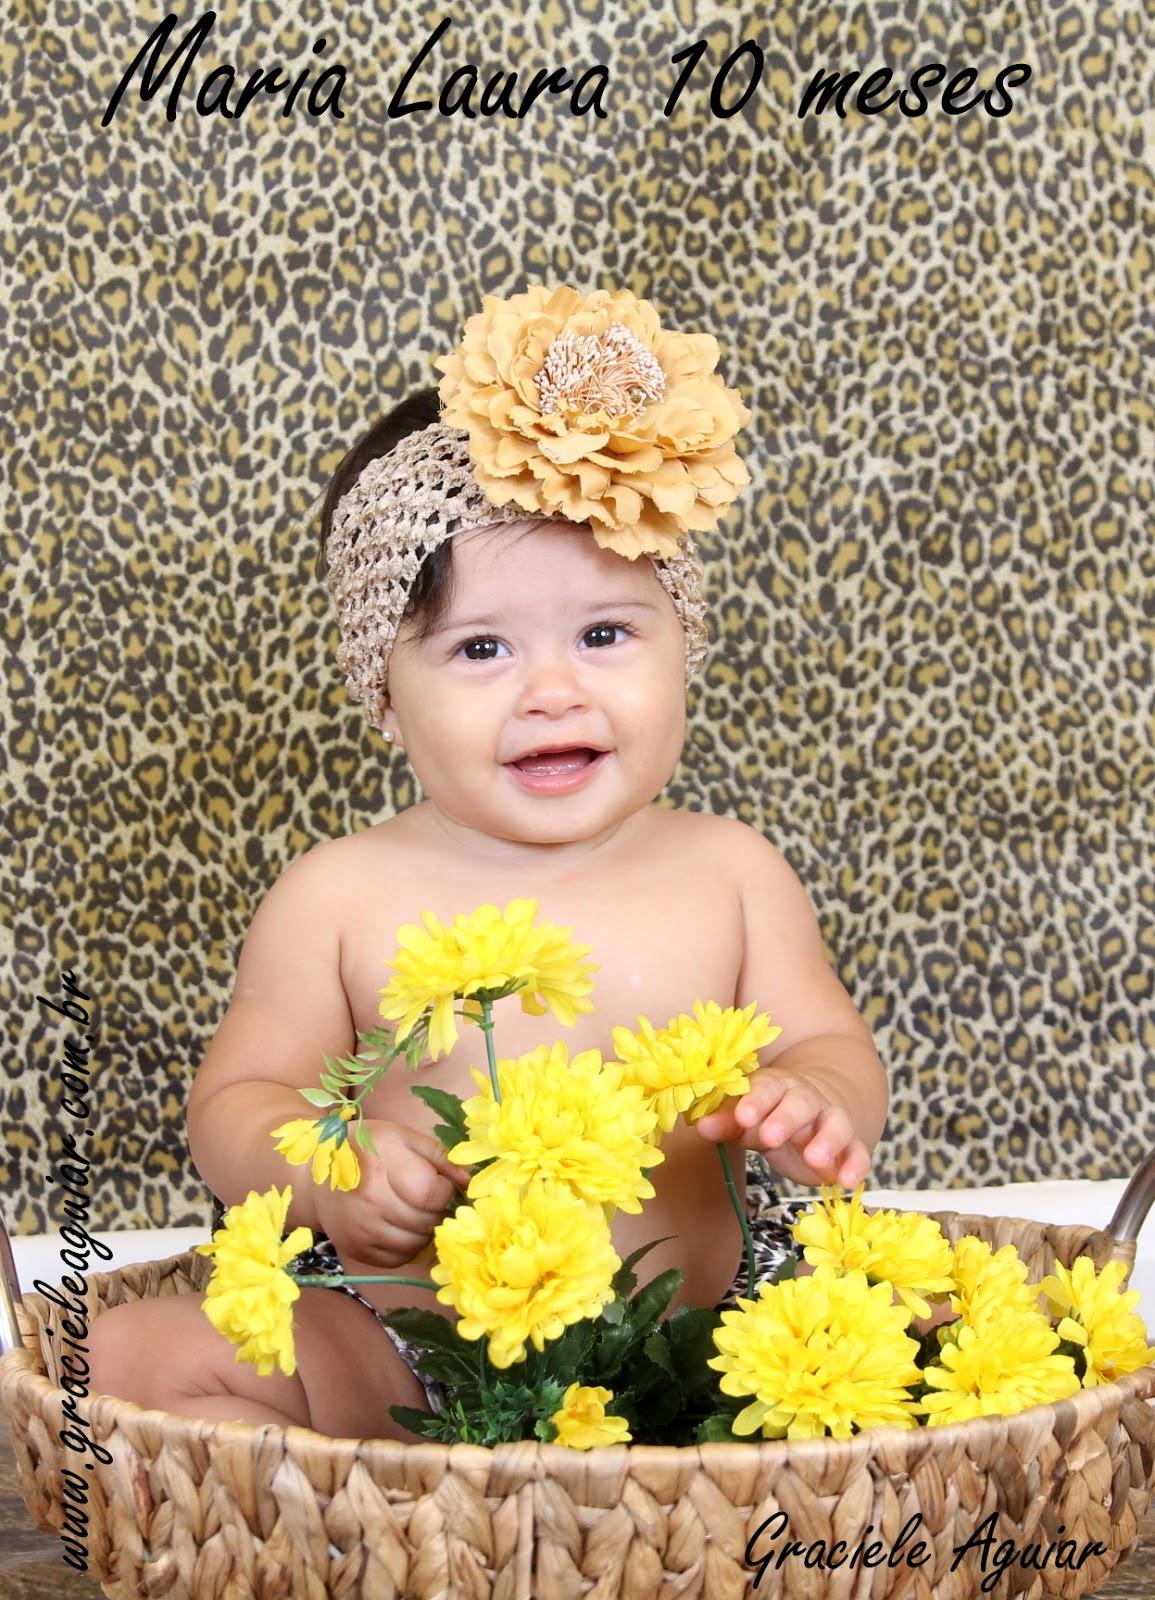 Cuti cuti book fotogr fico da maria laura 10 meses em belo horizonte - Bebe de 10 meses ...